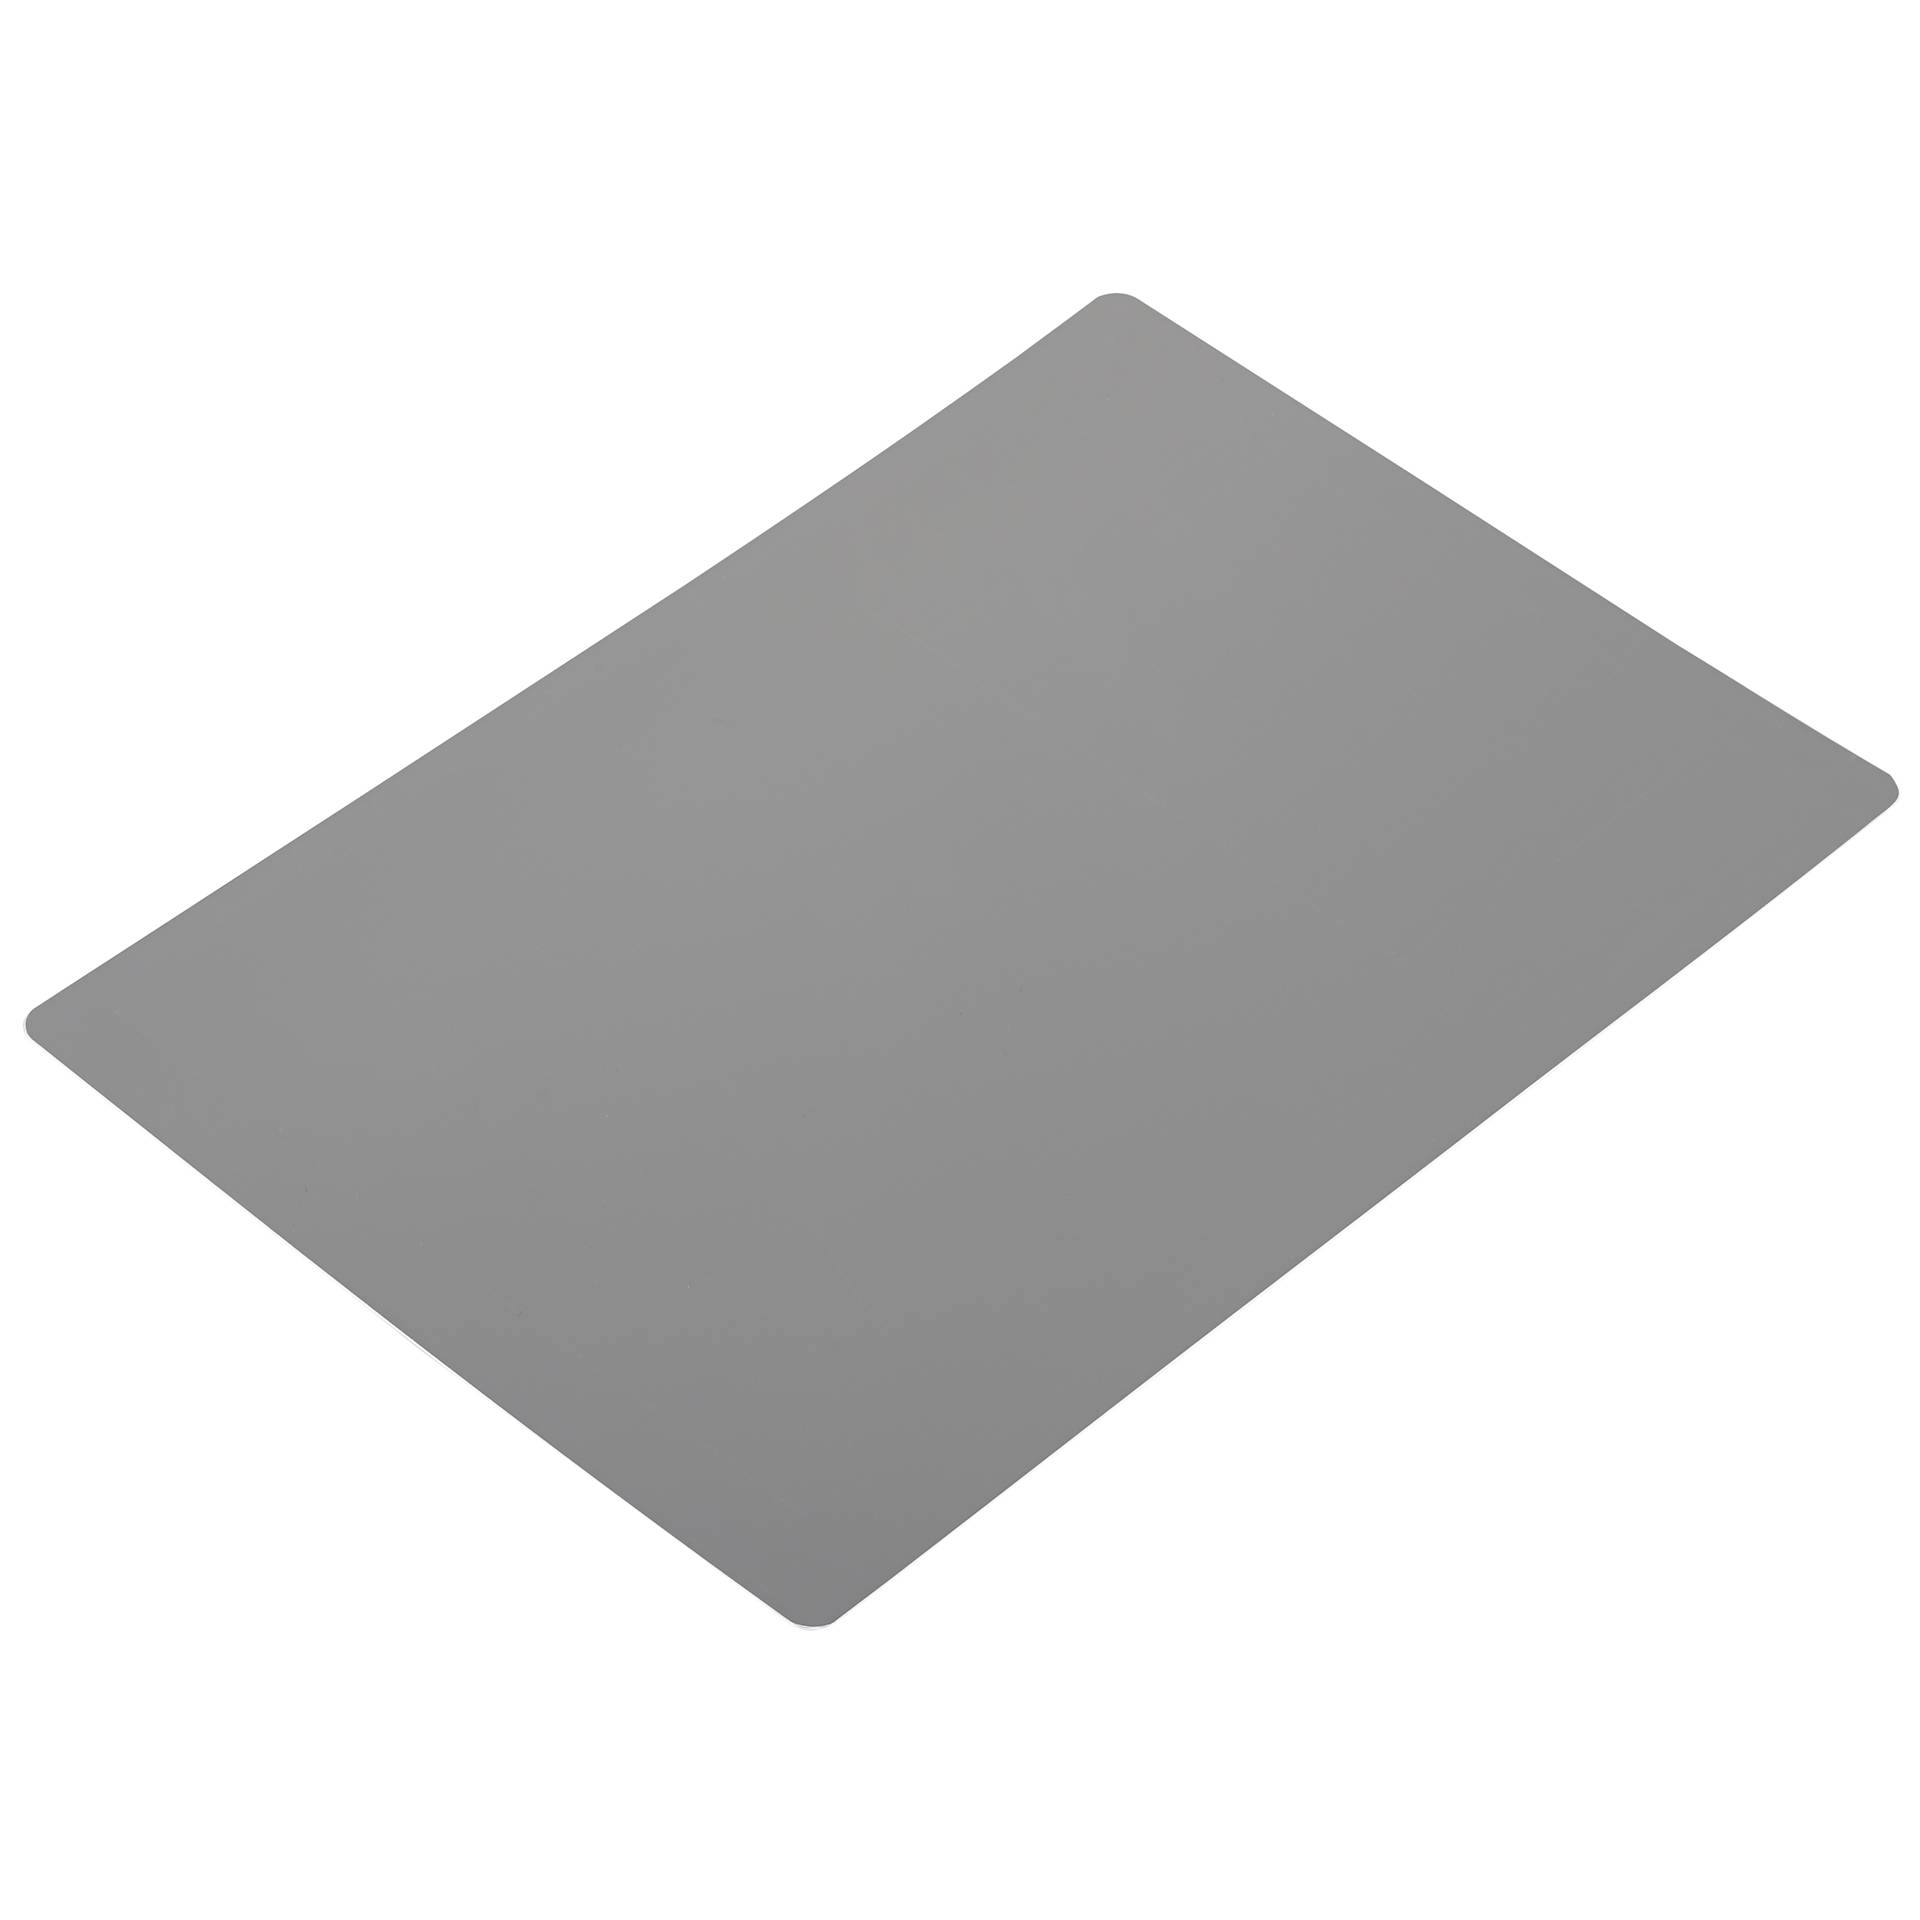 Novoflex Kontrollkarte ZEBRA XL grau / weiss 21 x 30 cm